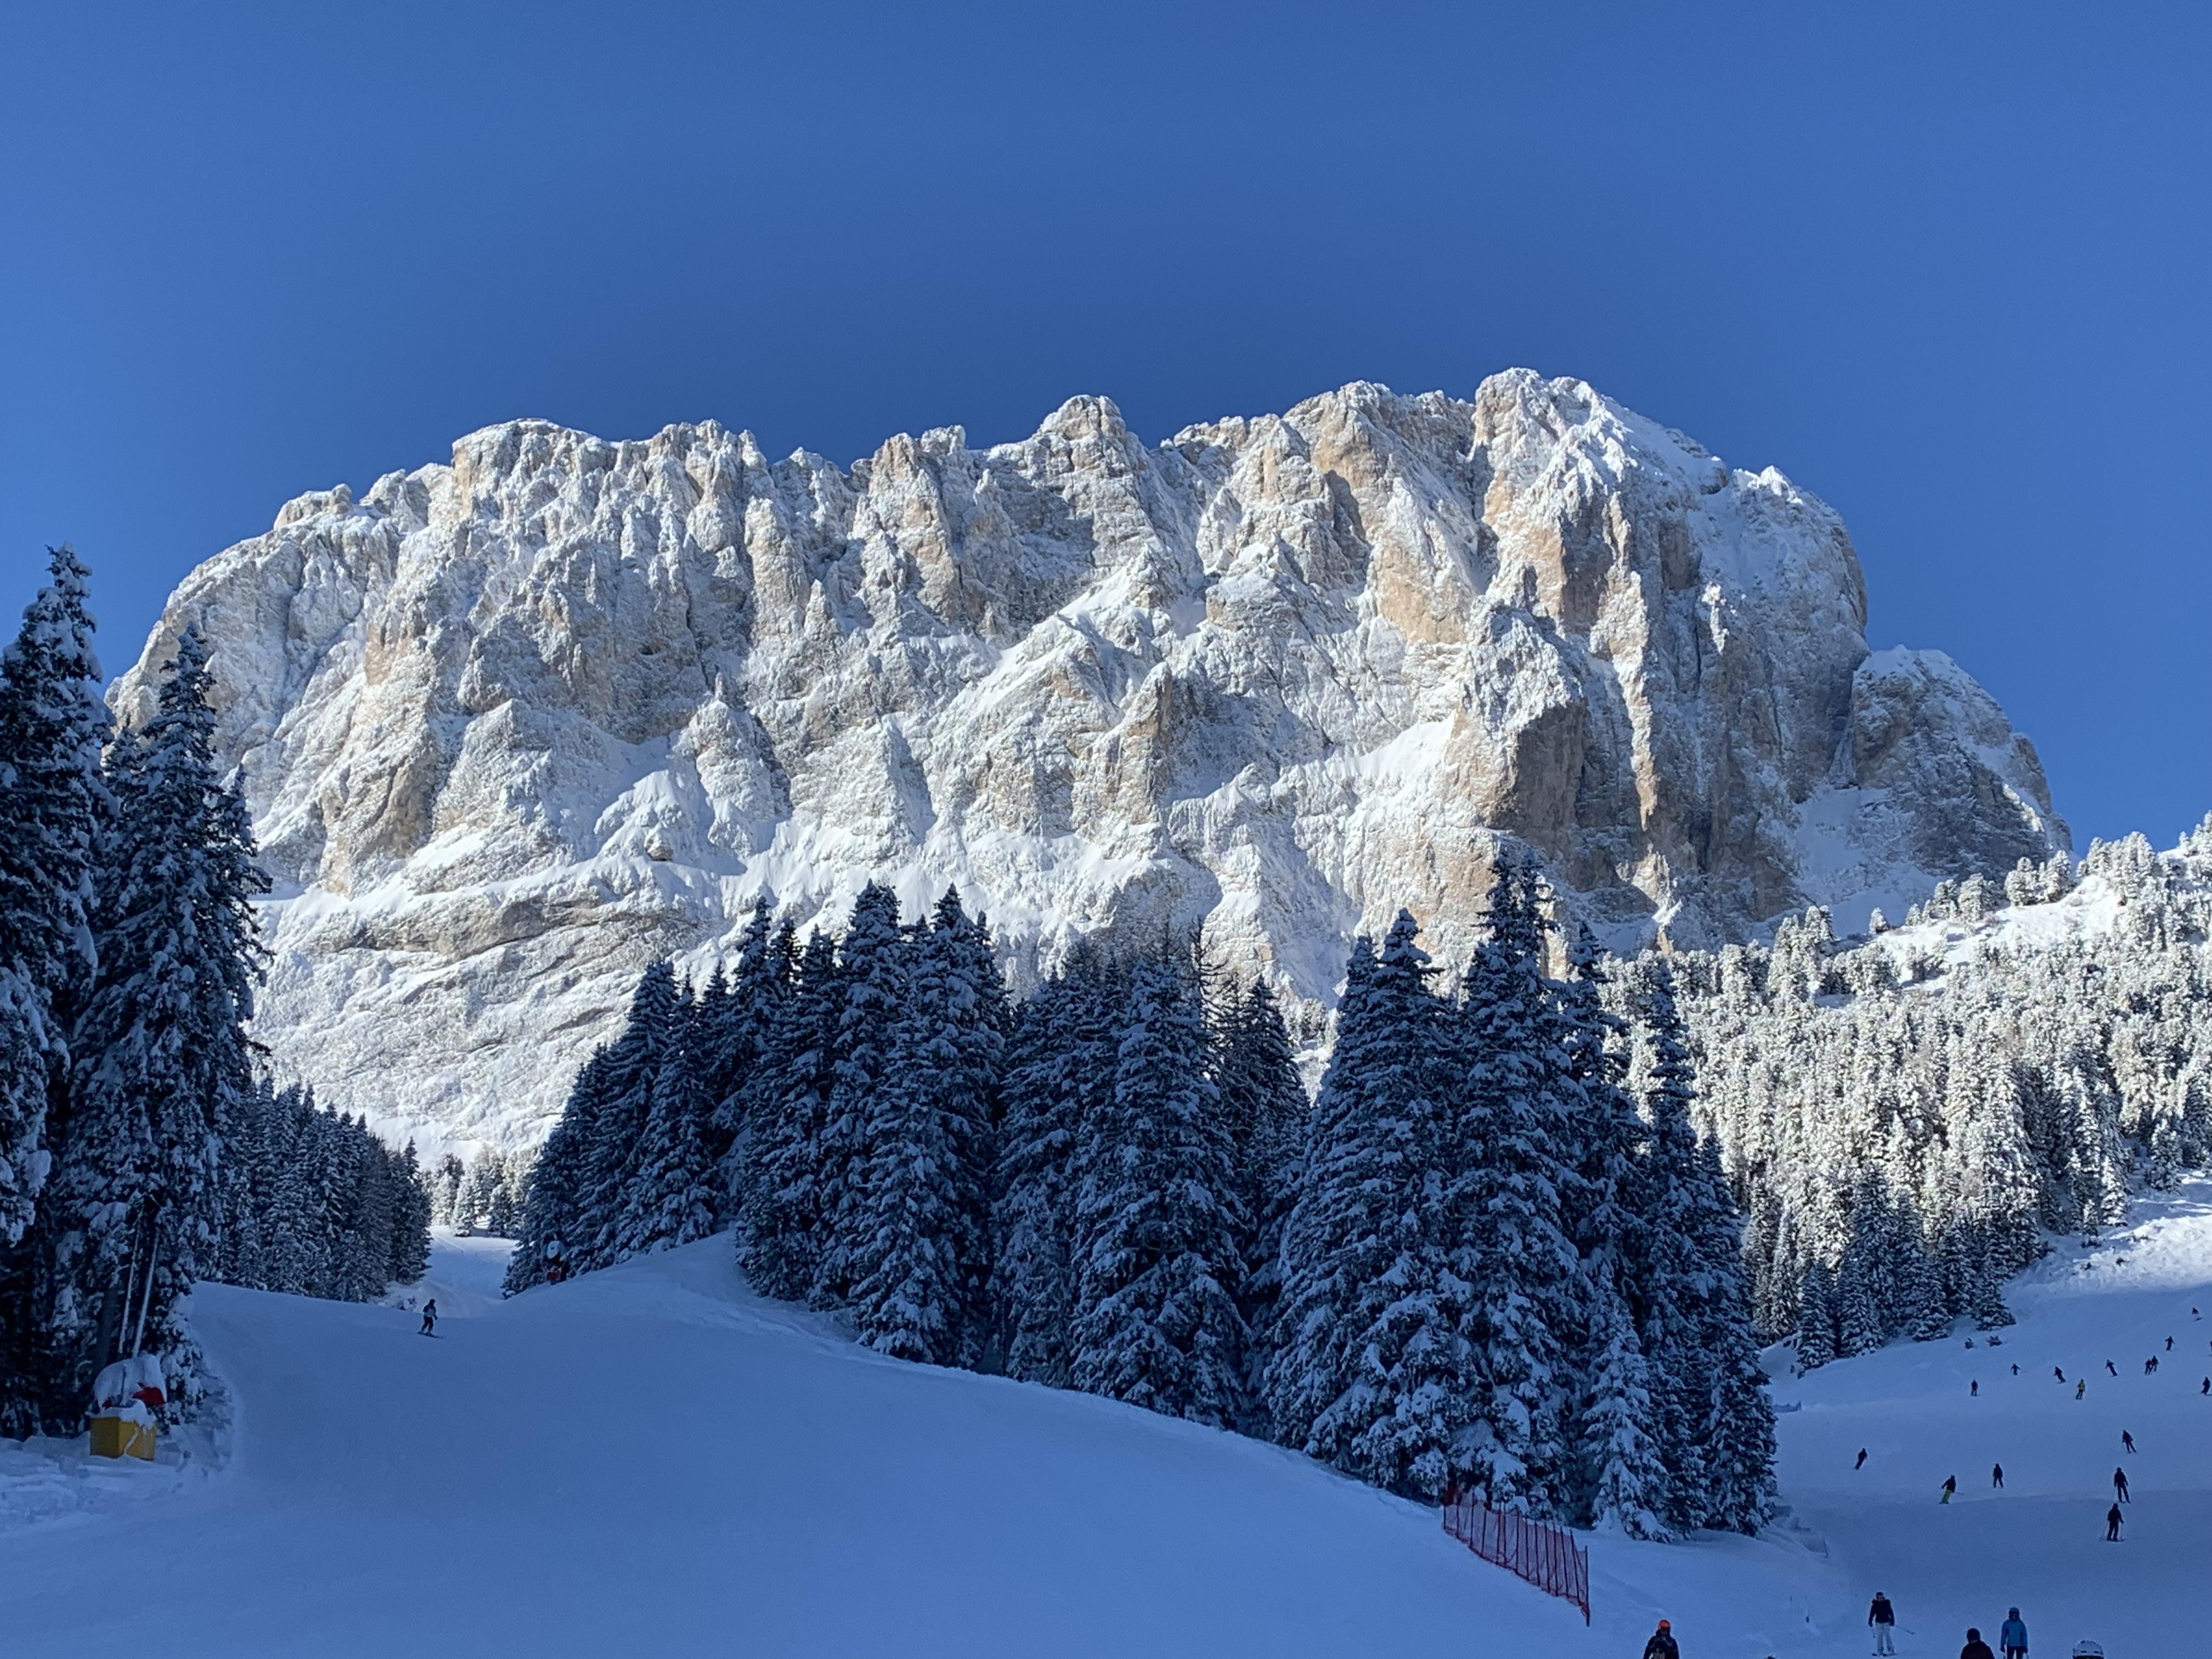 Горы пейзаж Вальгардена Доломиты Альпы лыжи Сассо Лунго Альберт Сафиуллин